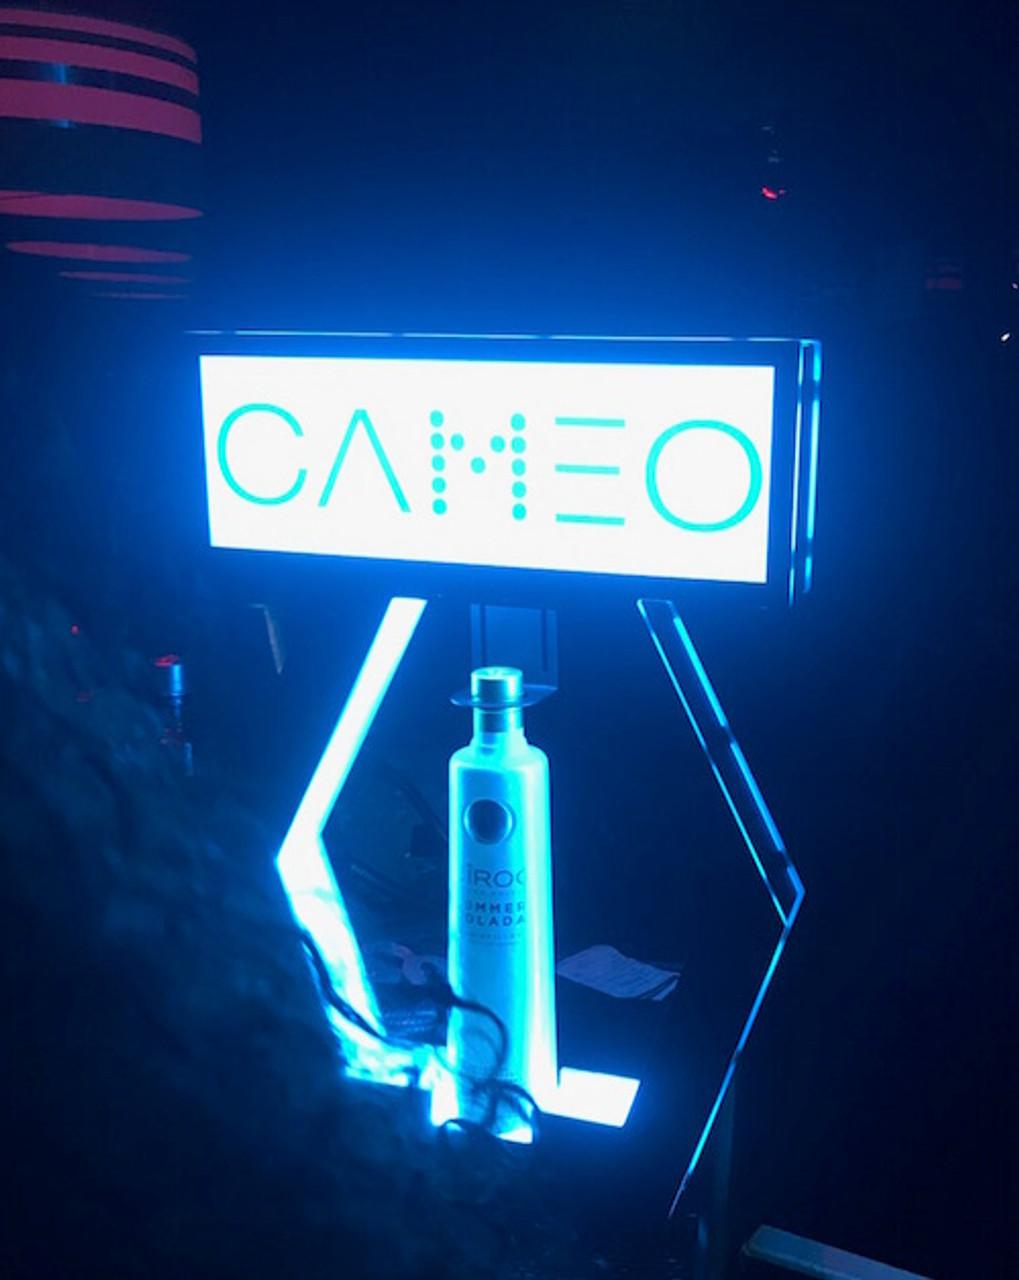 Bottle_Glorifier_Bottle Top_sign_interchangeable_Banner_window_Universal_Champagne_bottle_Liquor_